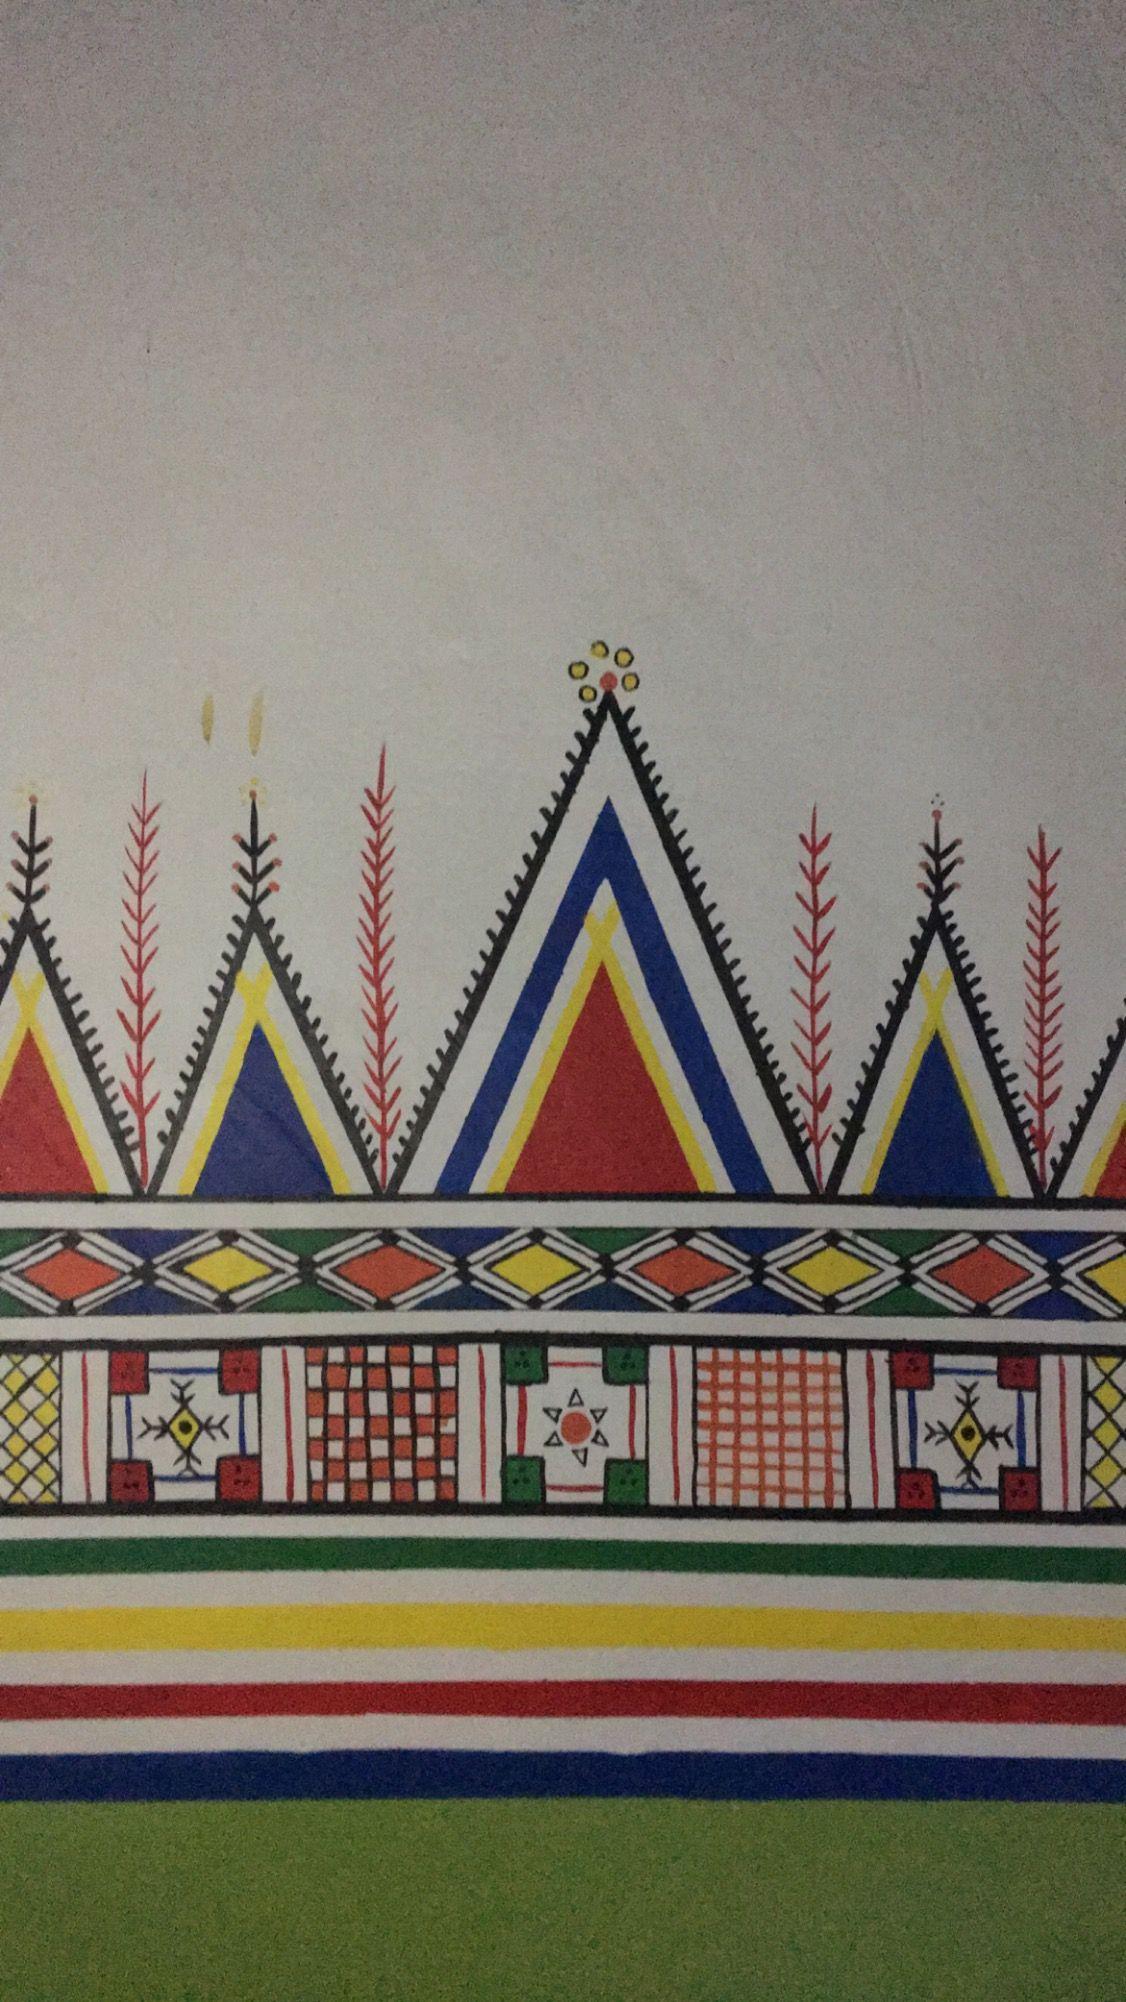 Pin By Hanan On المنطقه Art Hand Work Design Arts And Crafts